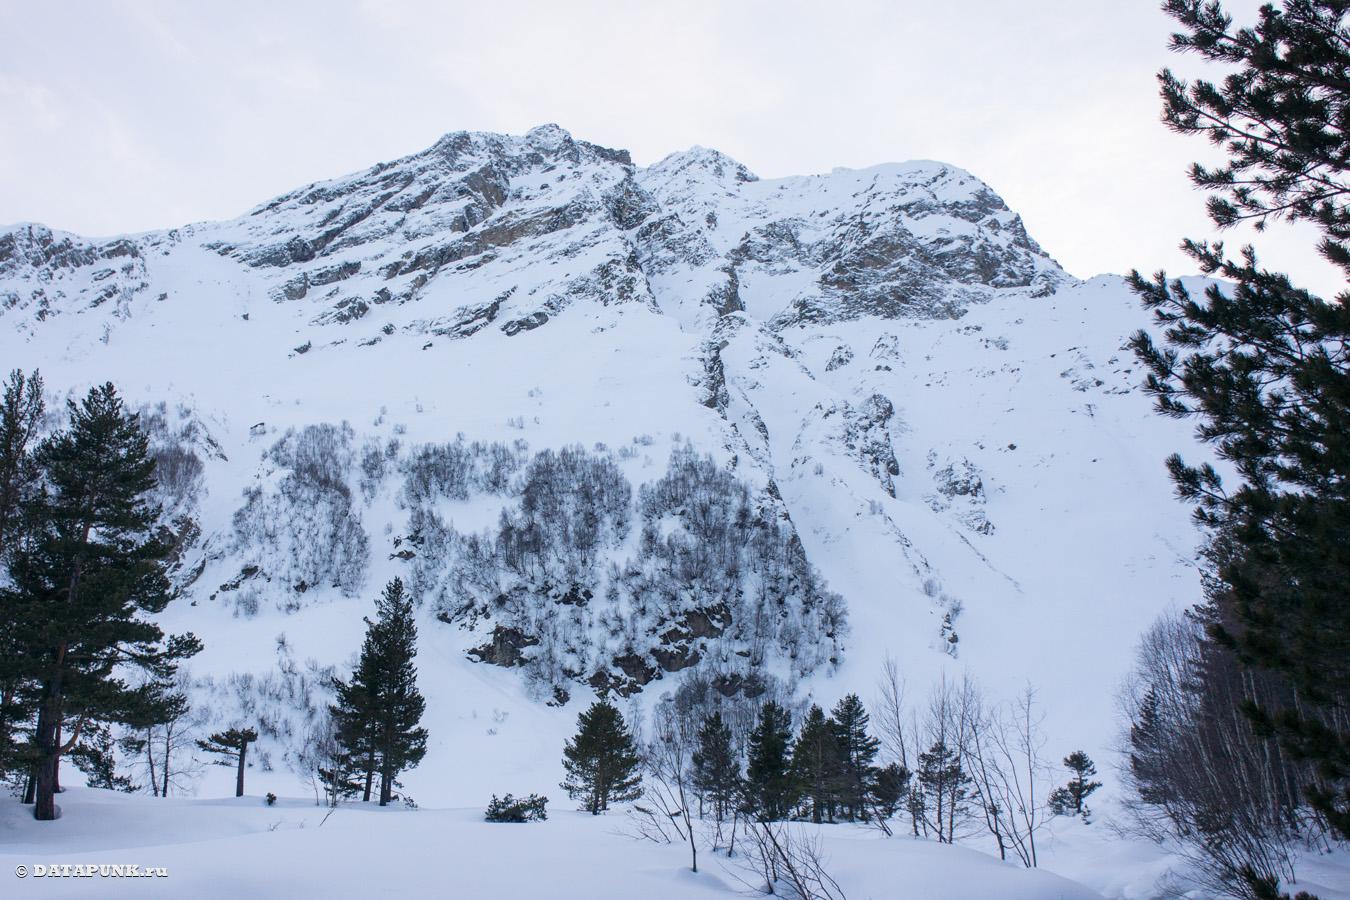 национальный парк эльбрус